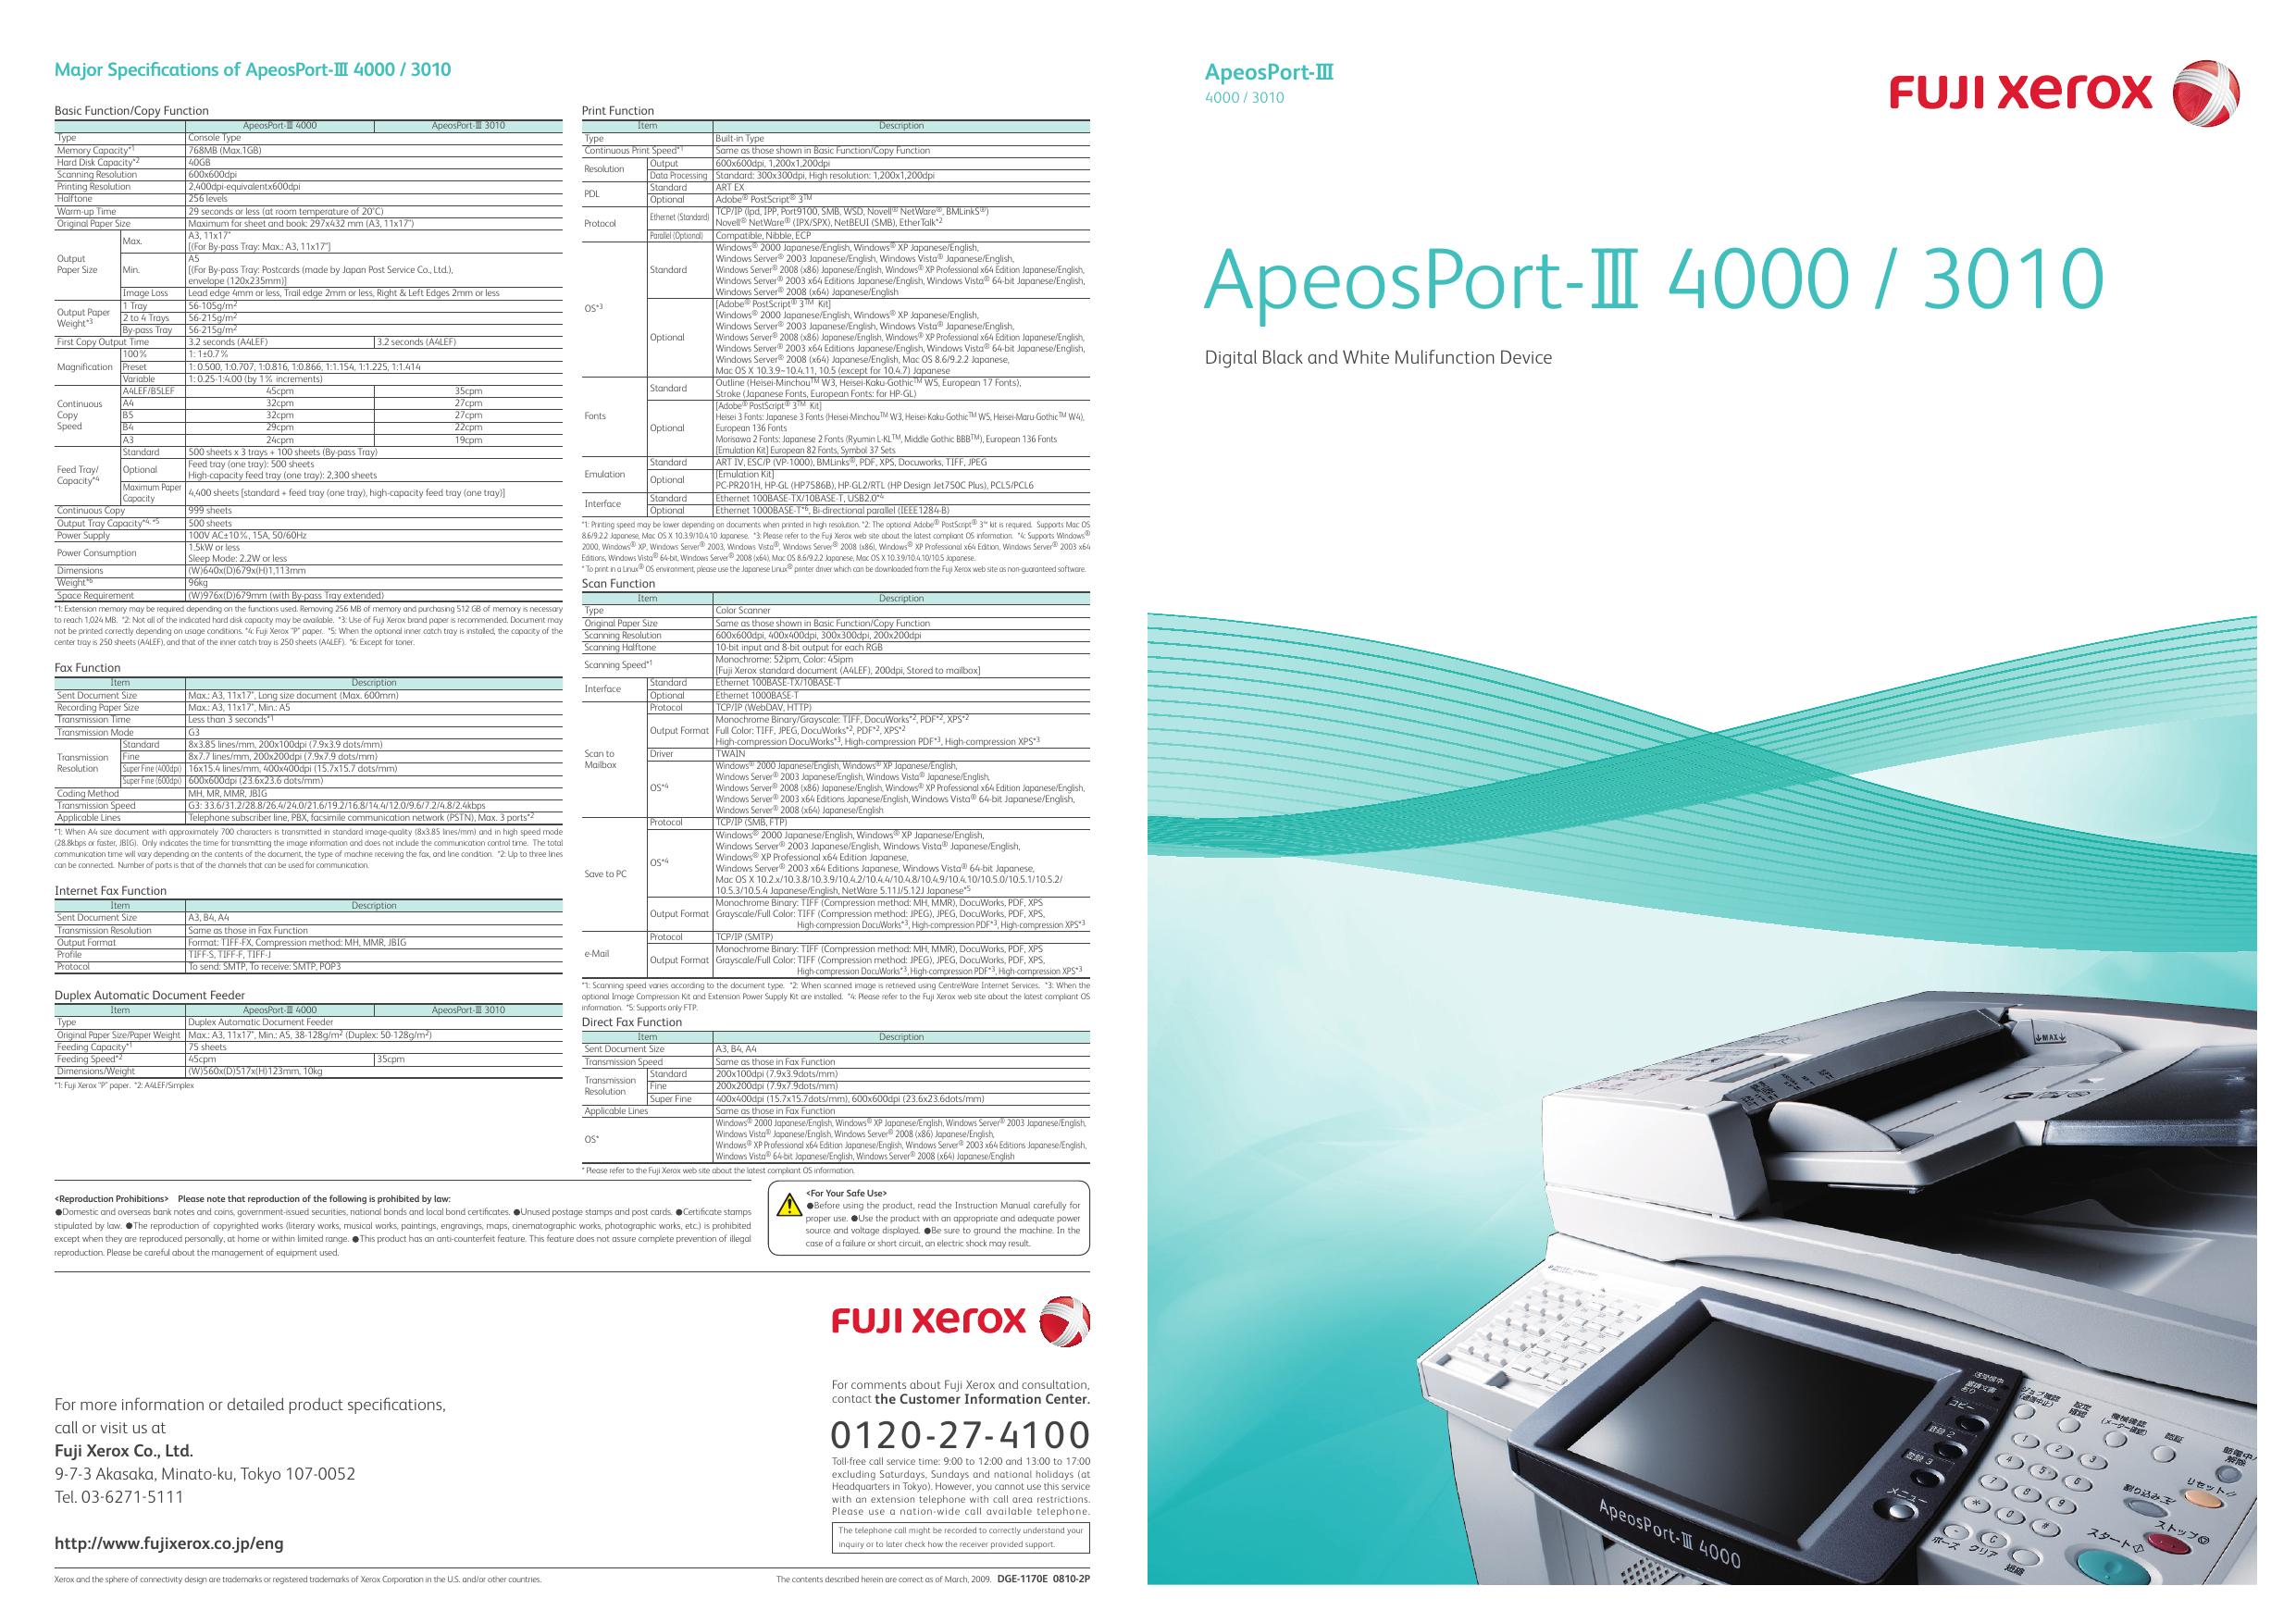 FX APEOSPORT-III 3010 DRIVER FOR WINDOWS DOWNLOAD